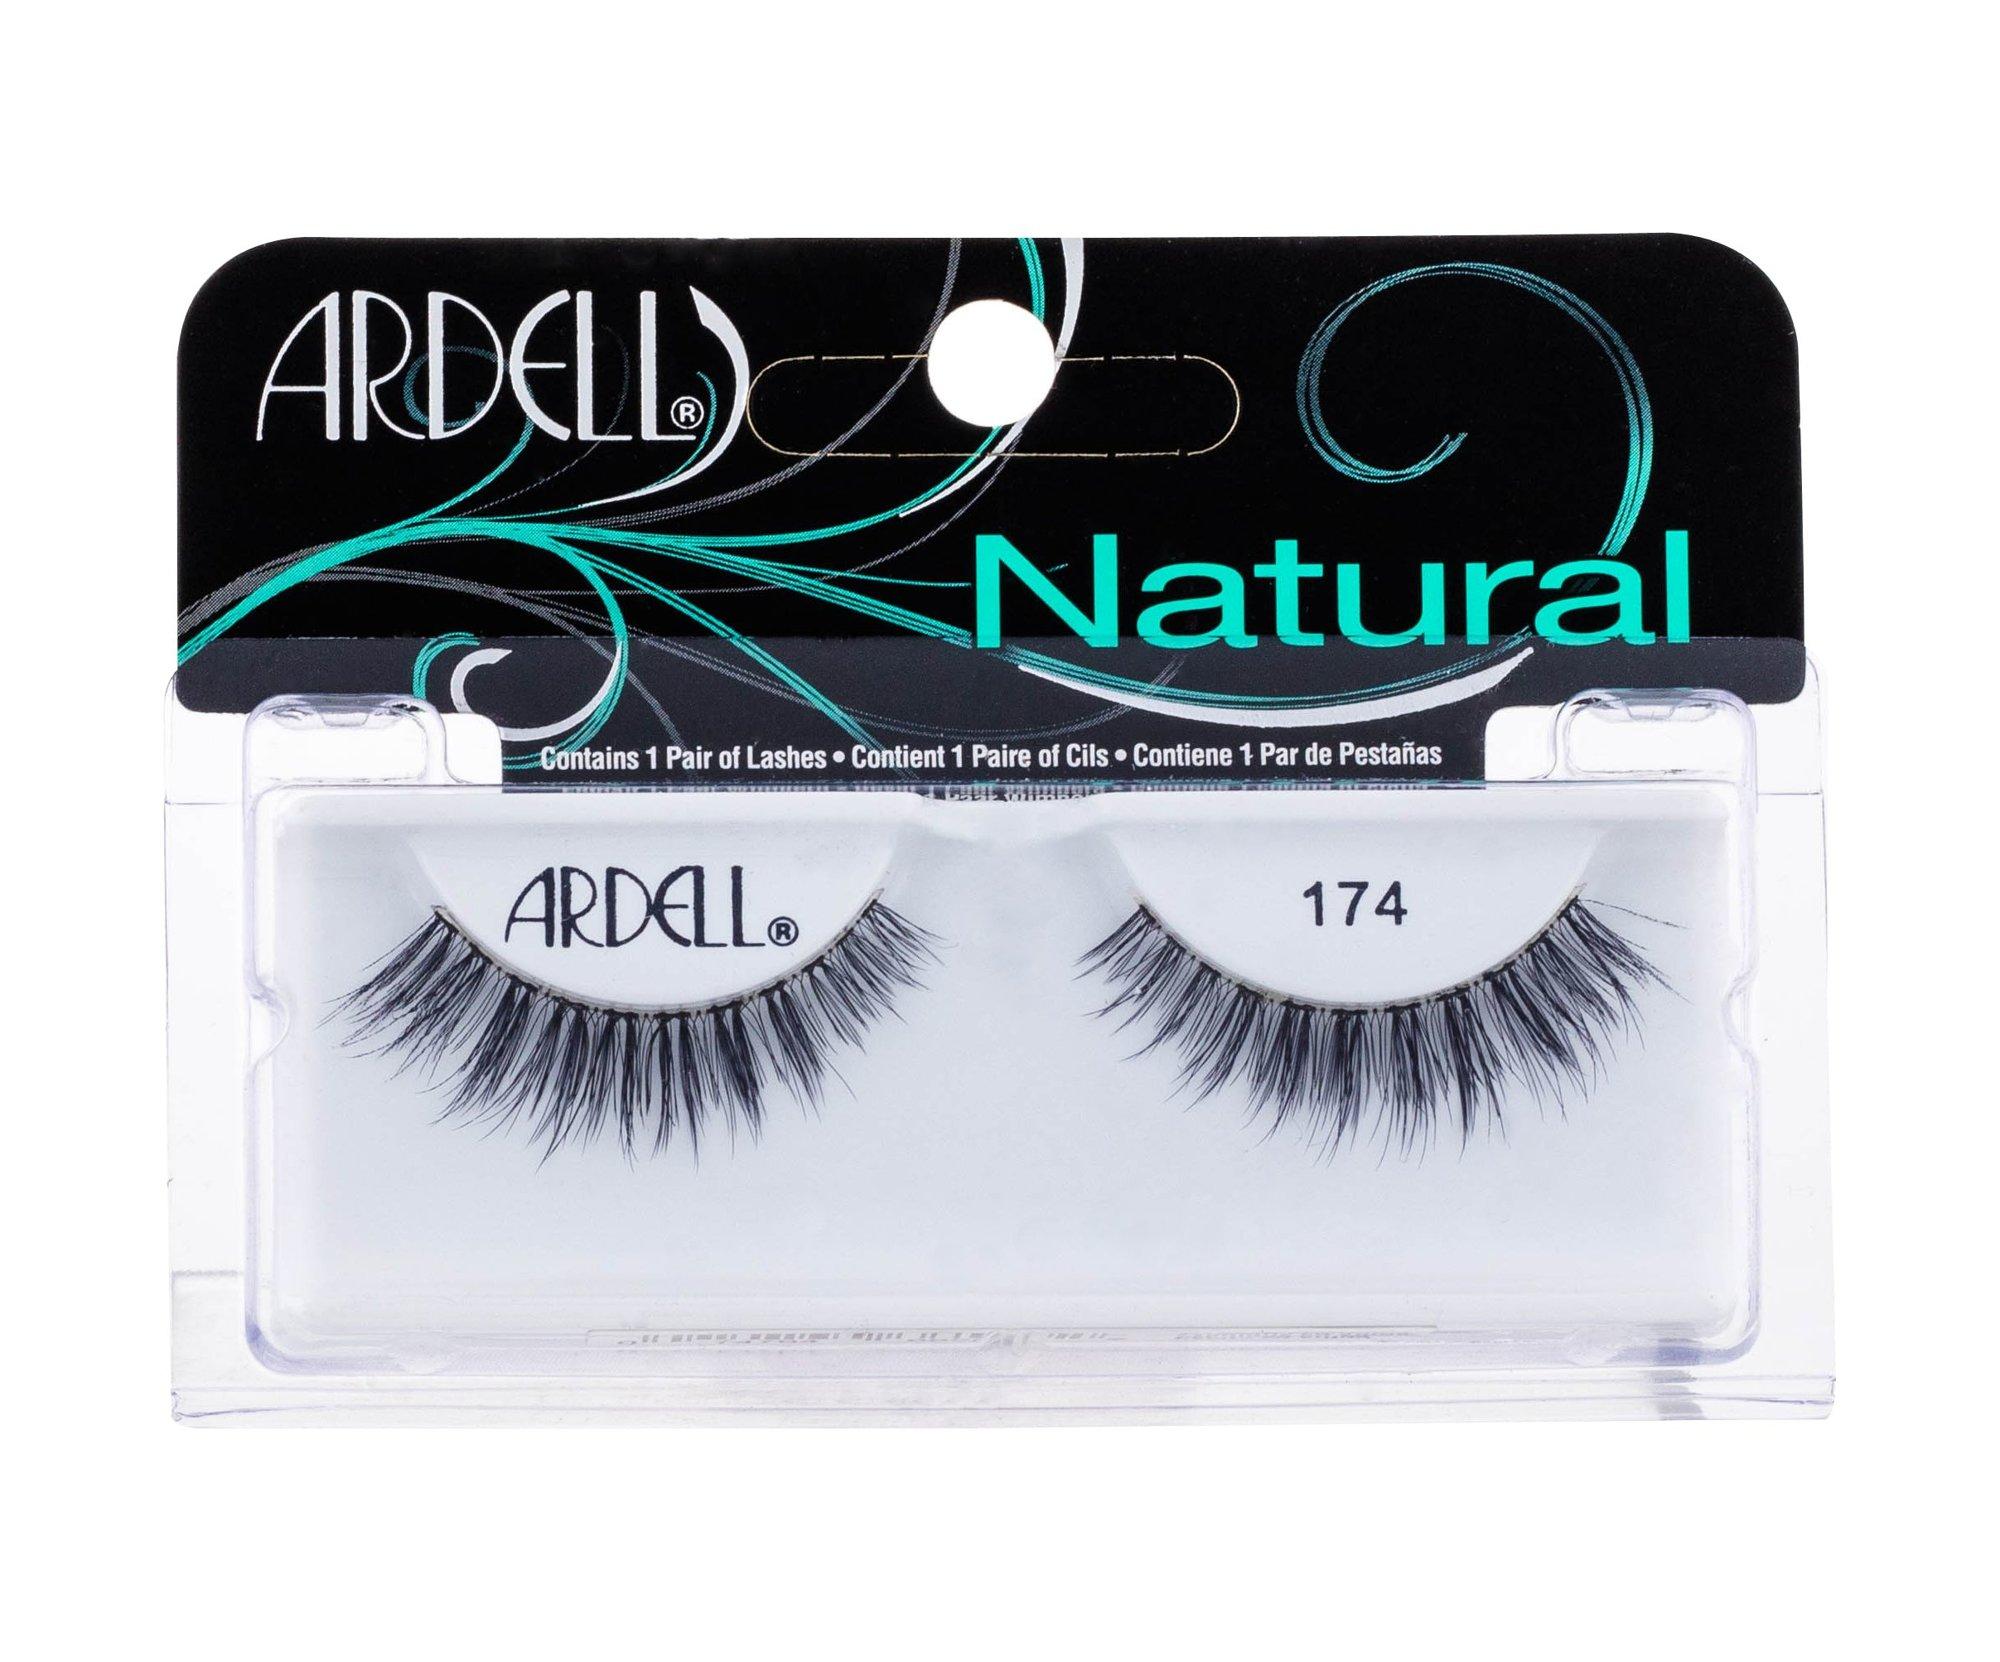 Ardell Natural False Eyelashes 1ml Black